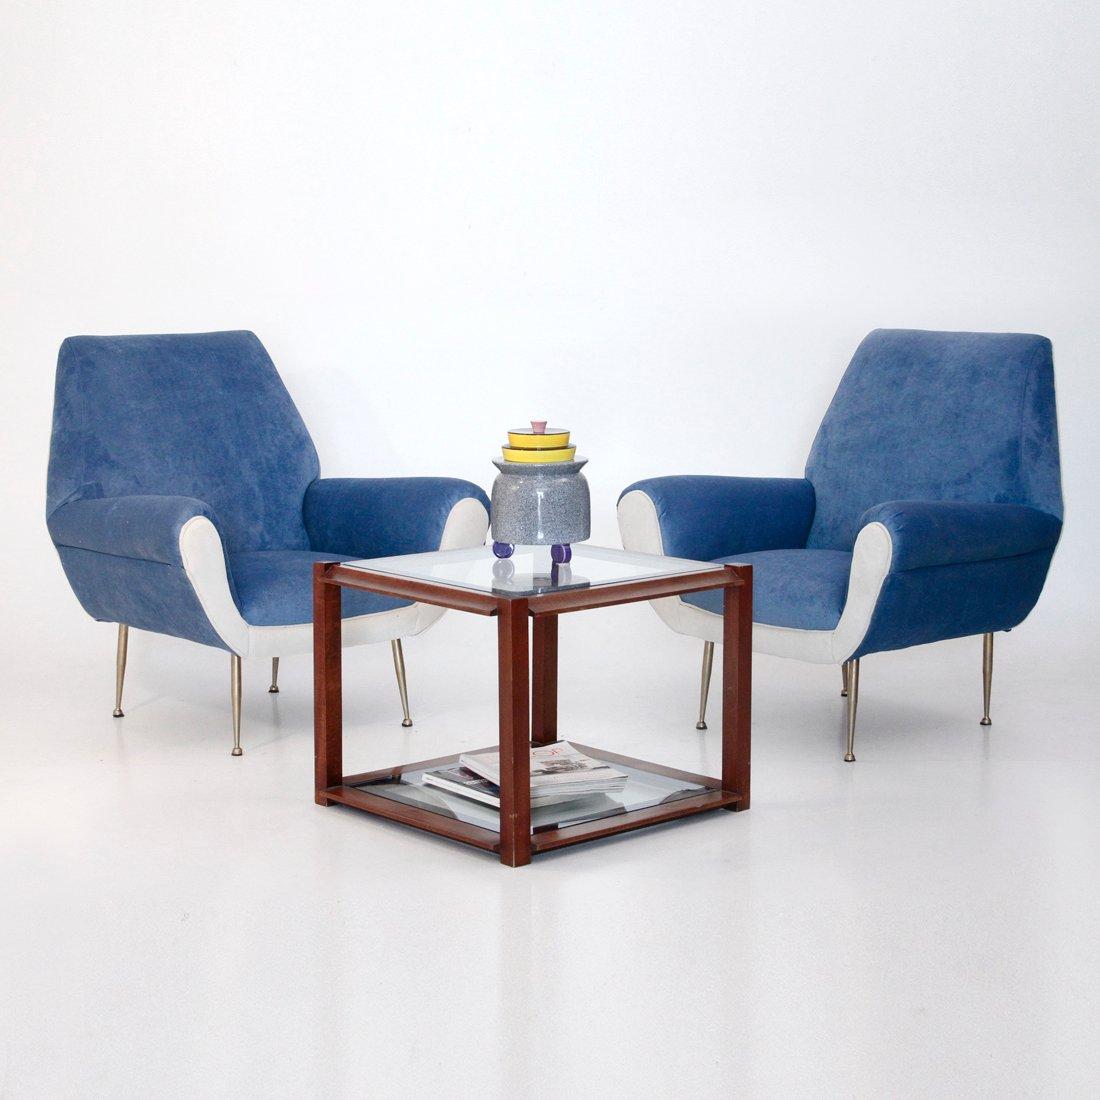 table basse carr e en bois italie en vente sur pamono. Black Bedroom Furniture Sets. Home Design Ideas